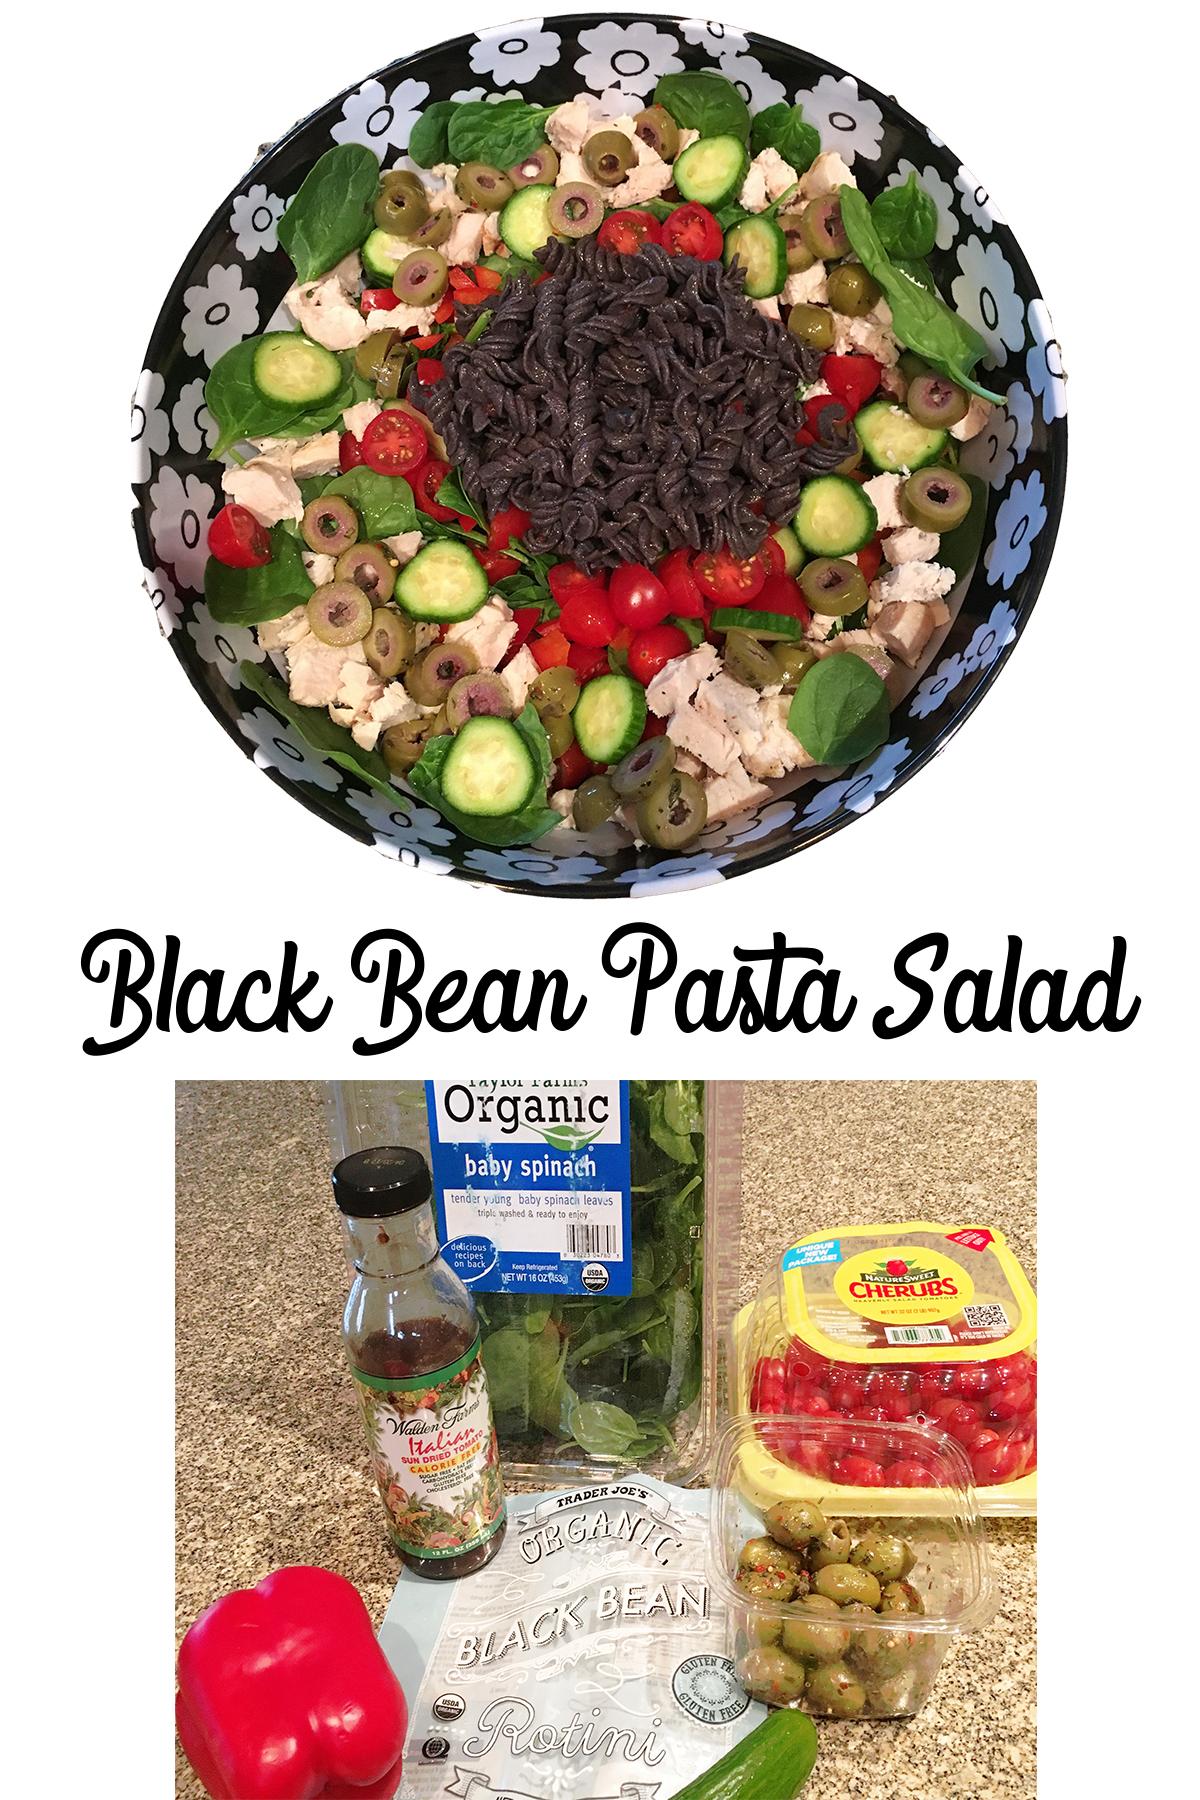 Yummy Black Bean Pasta Salad